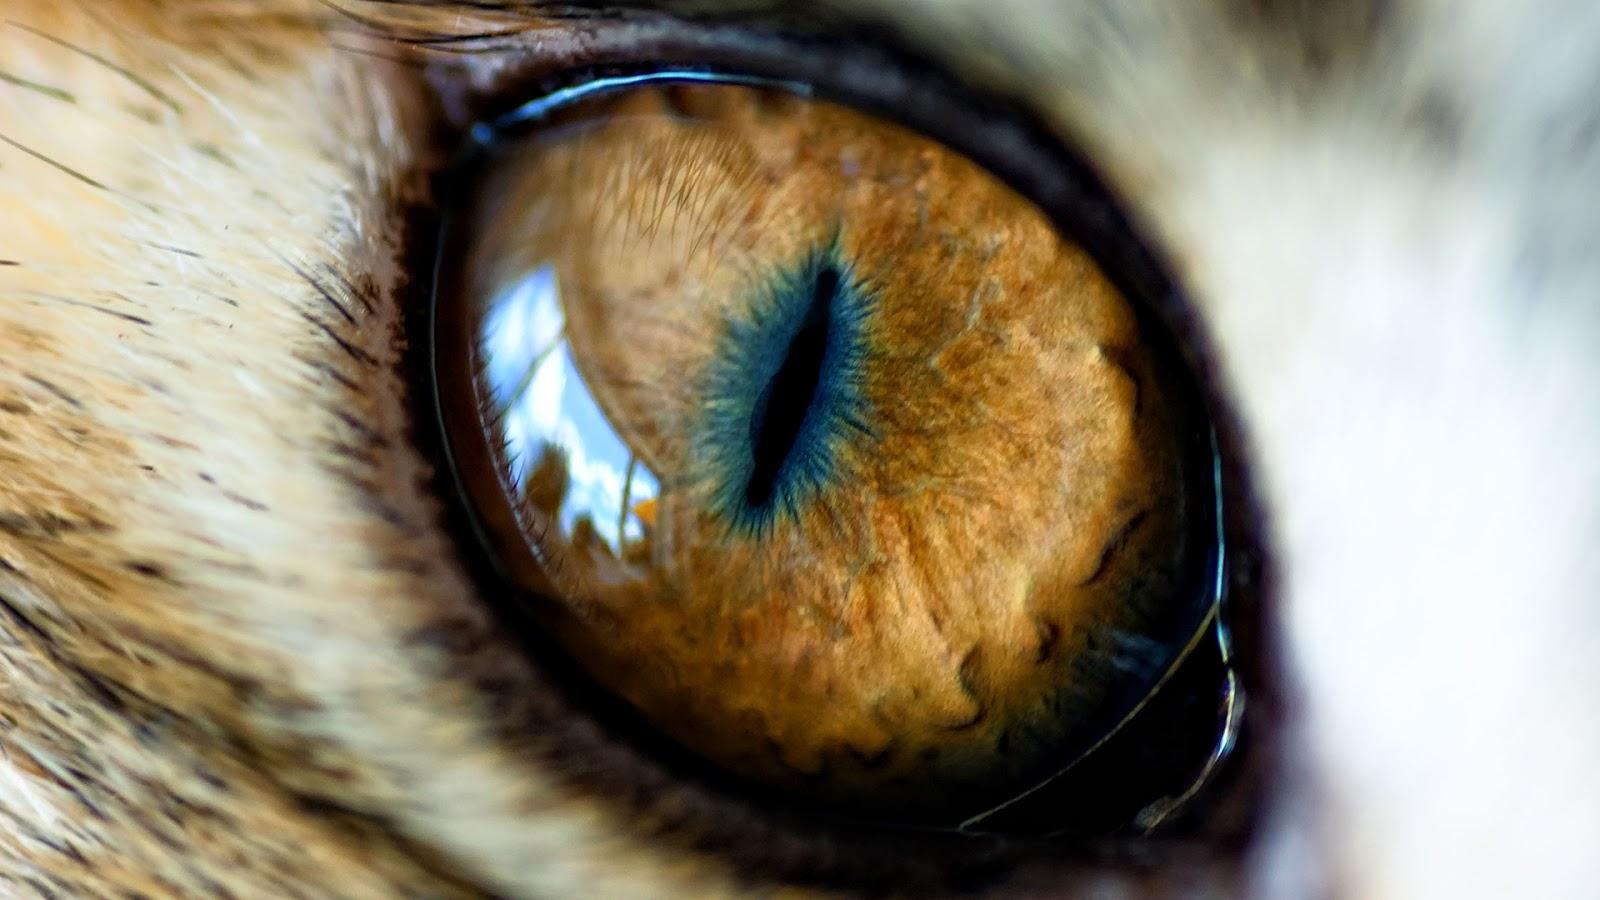 Gta 5 Car Wallpaper Cat eye,cat, wild anim...